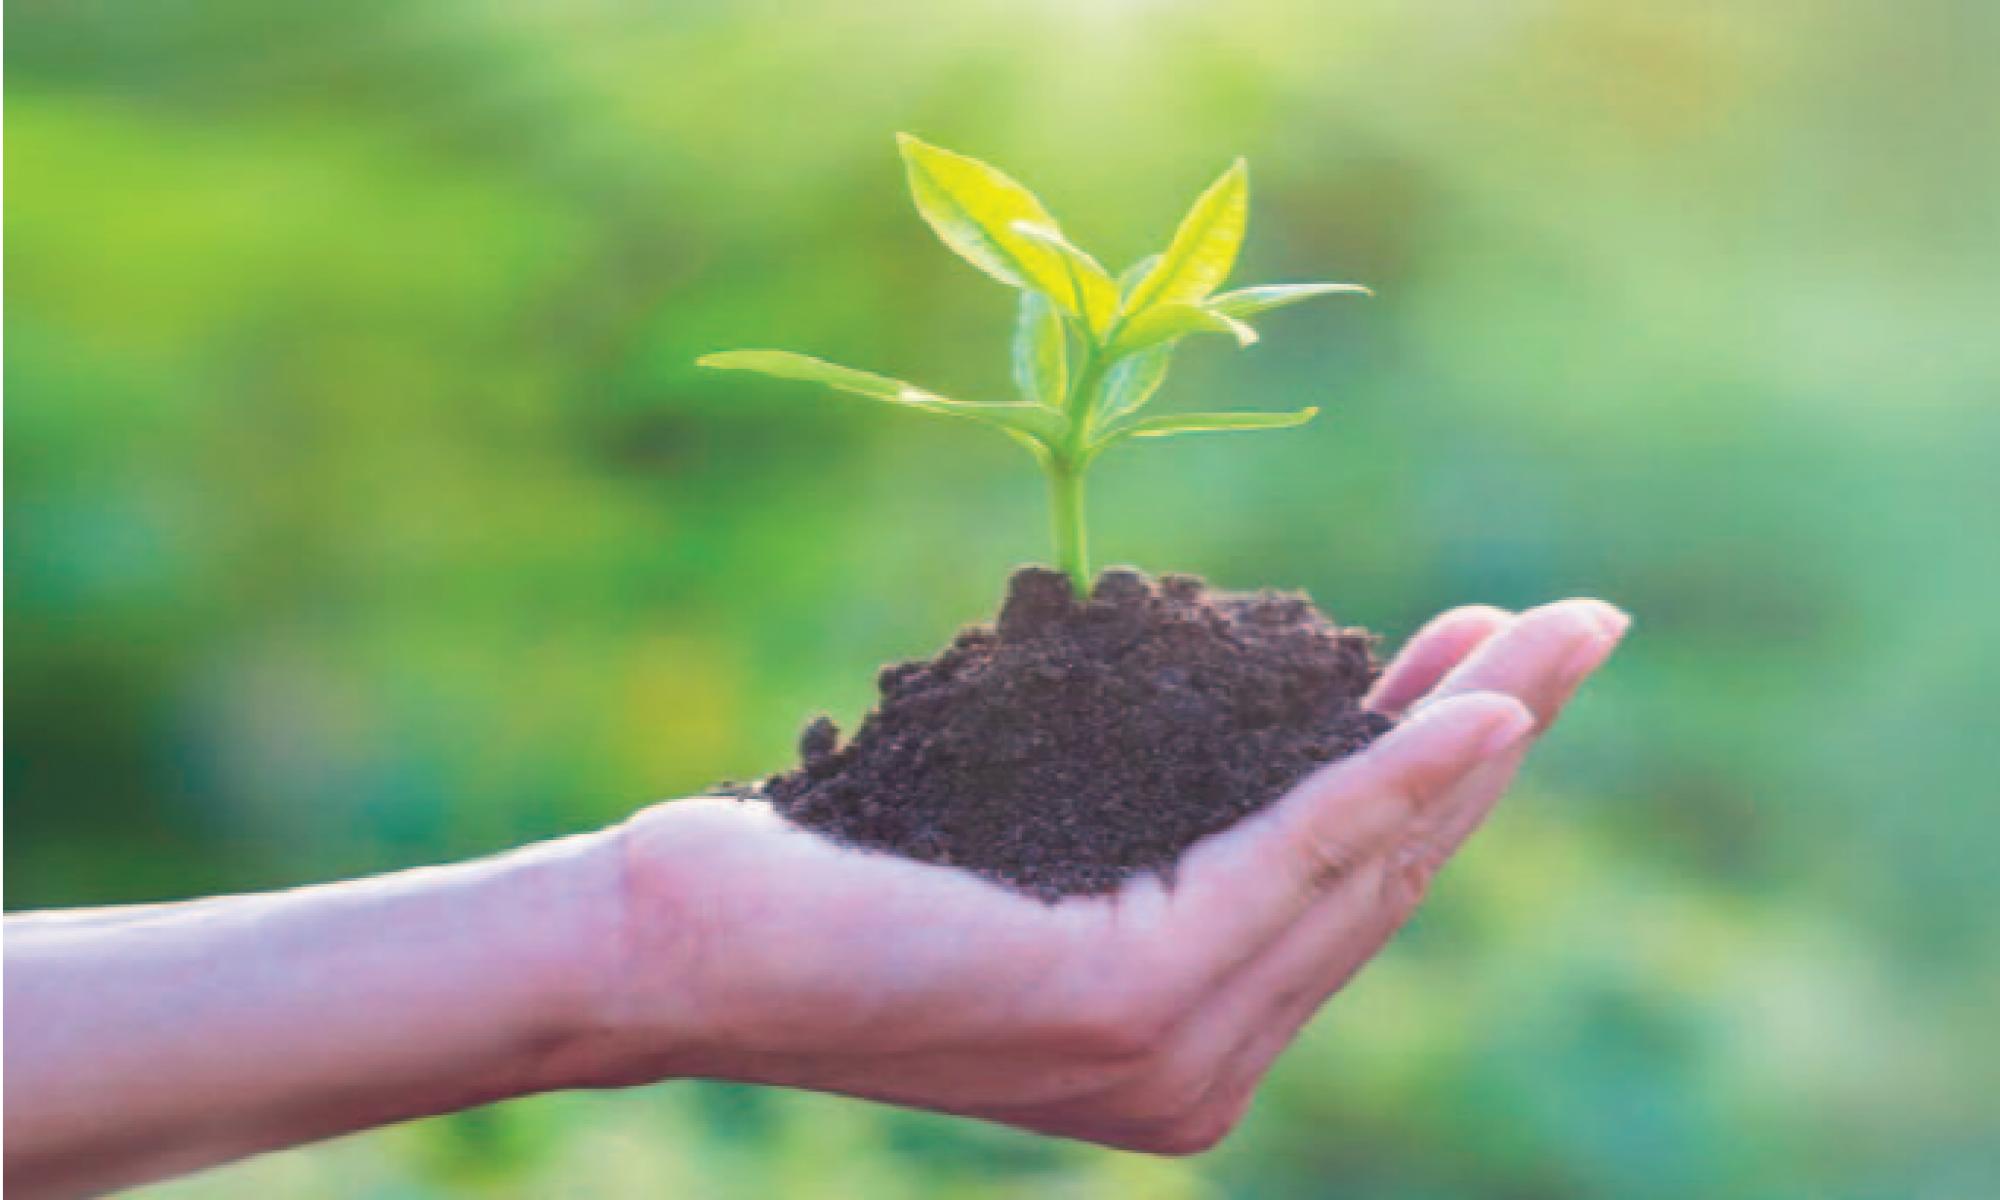 SUNAVIS - Digitizing Sustainable Value Chains